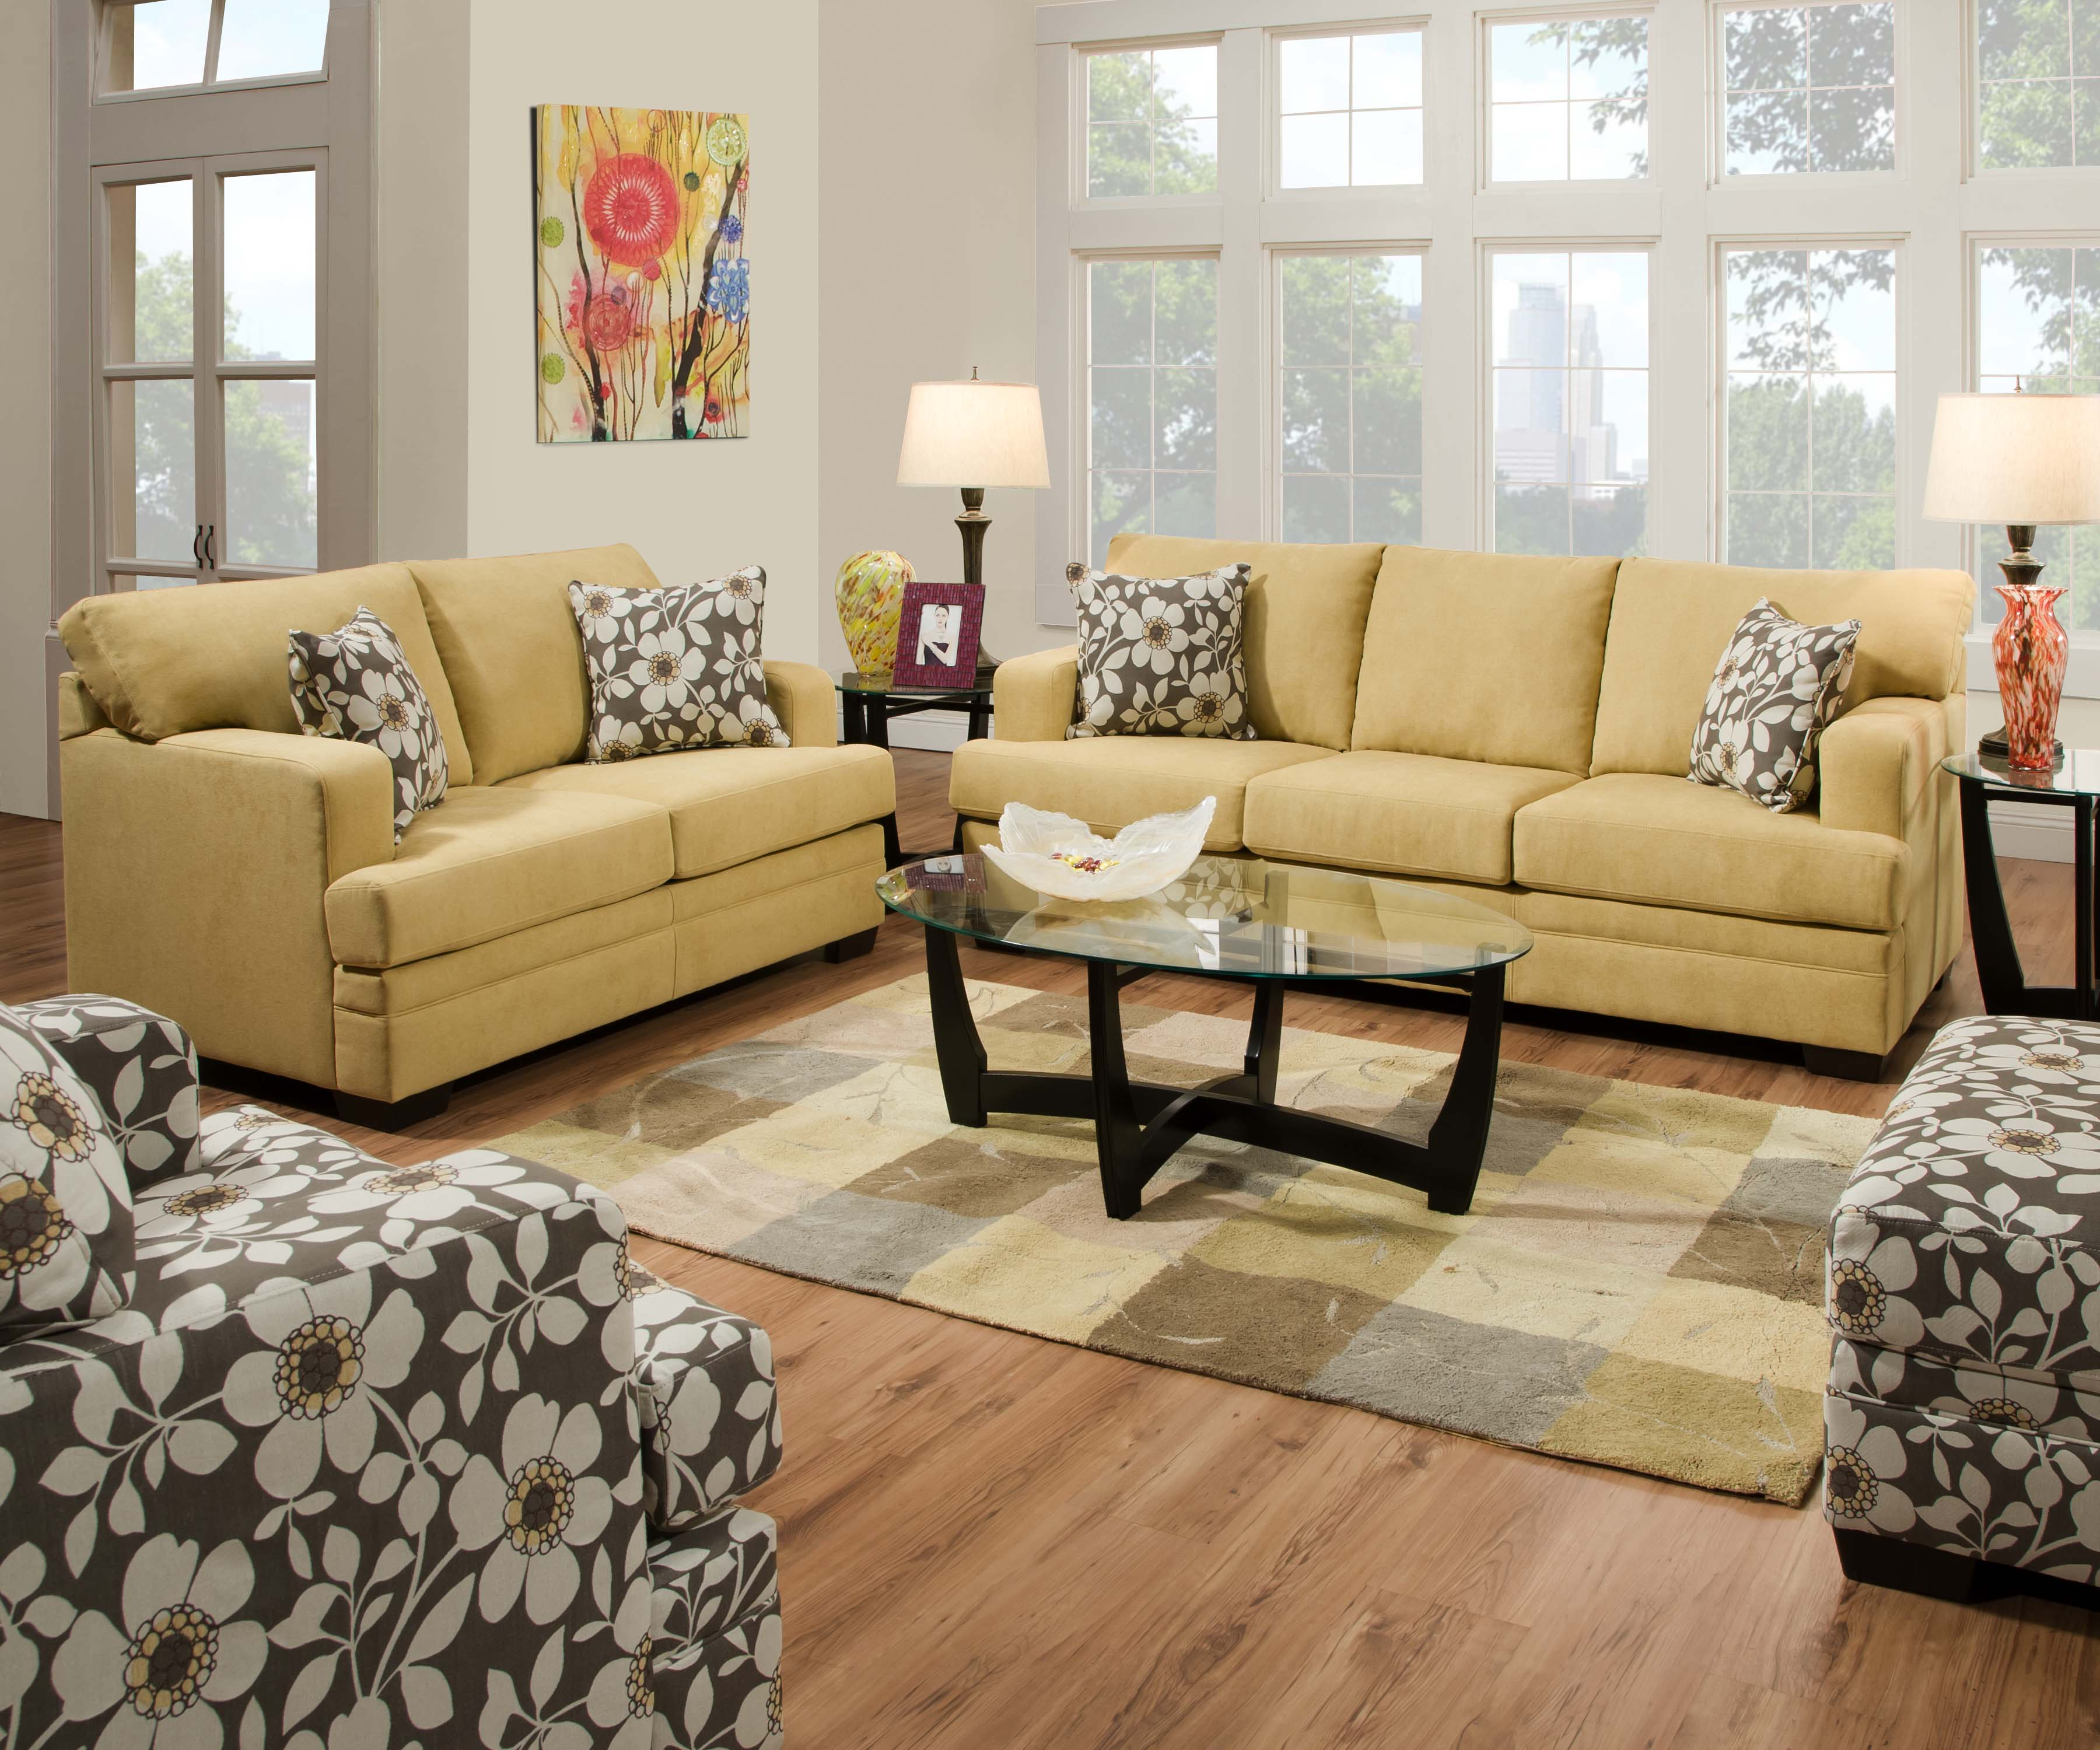 Living room furniture pellis 3 piece living room set cornsilk